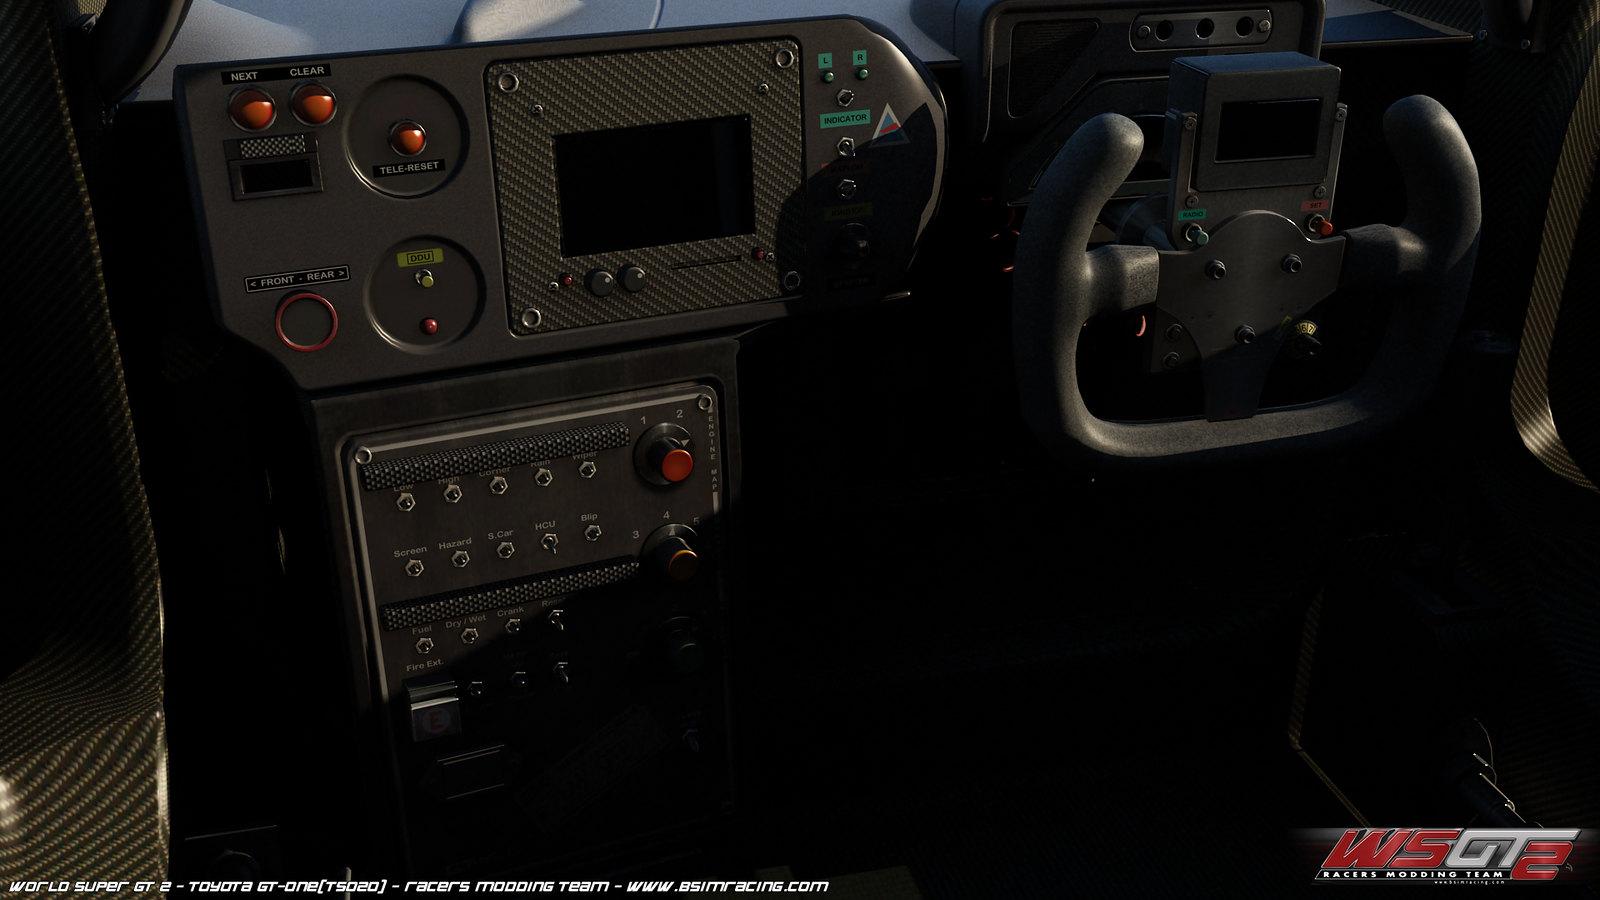 TS020-cockpit_1920